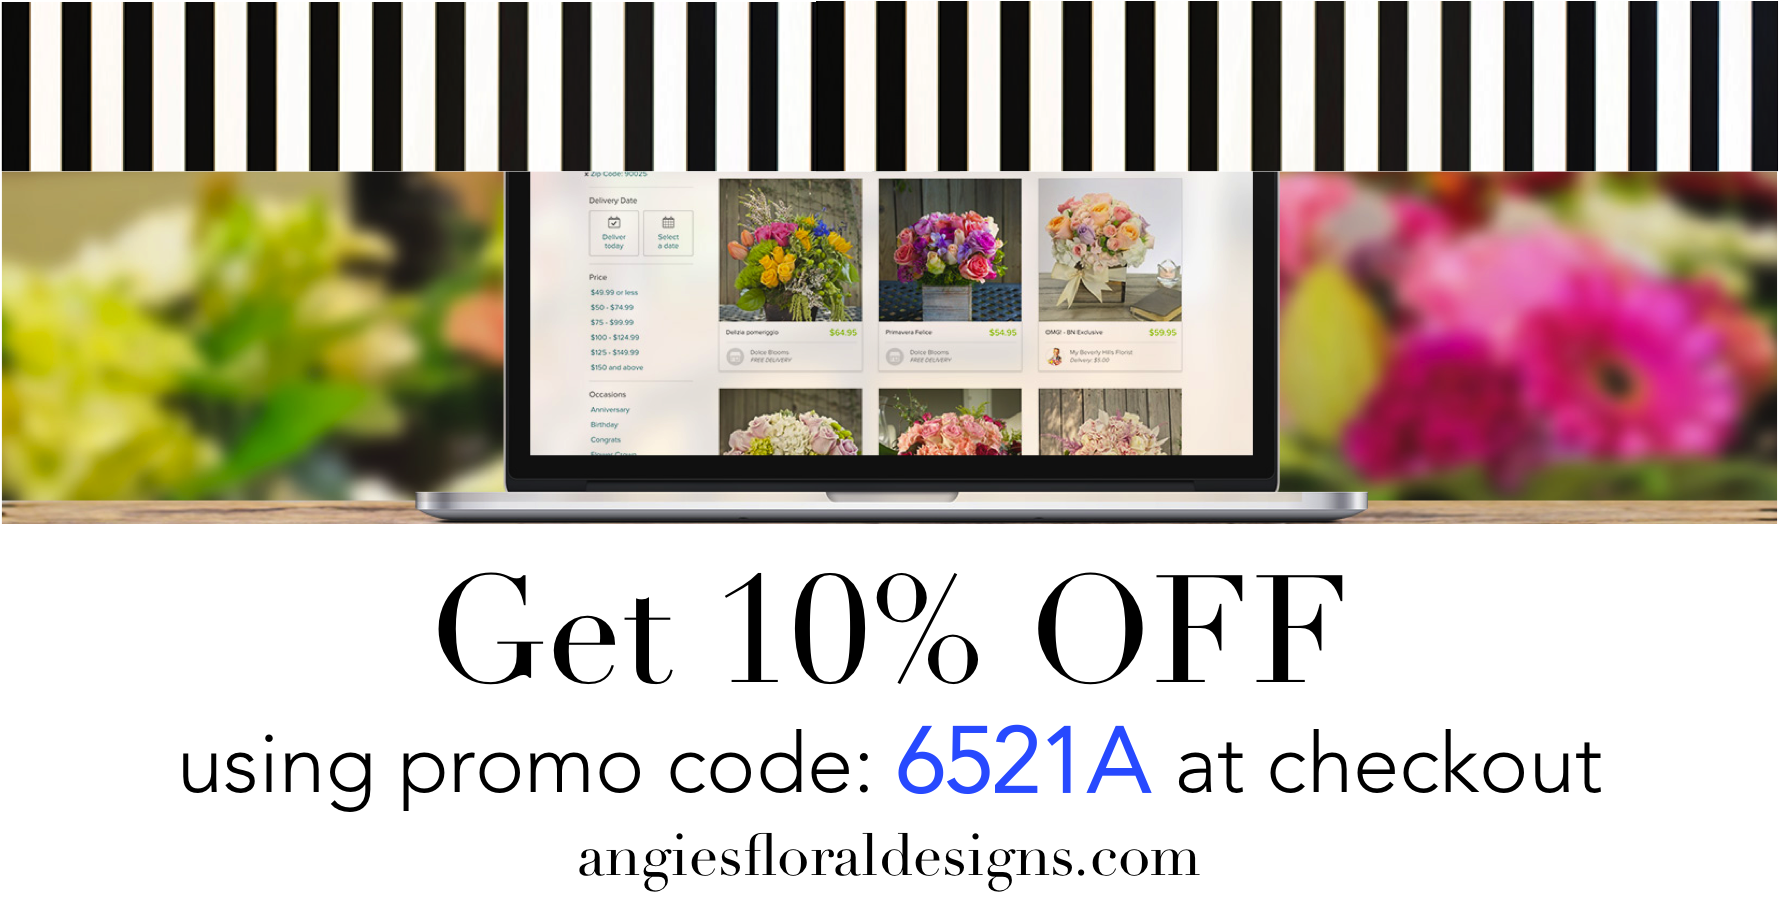 -.angies-floral-designs-el-paso-florist-el-paso-flowers-el-paso-florist-angies-flowers-el-paso-floral-design-79912-png.png